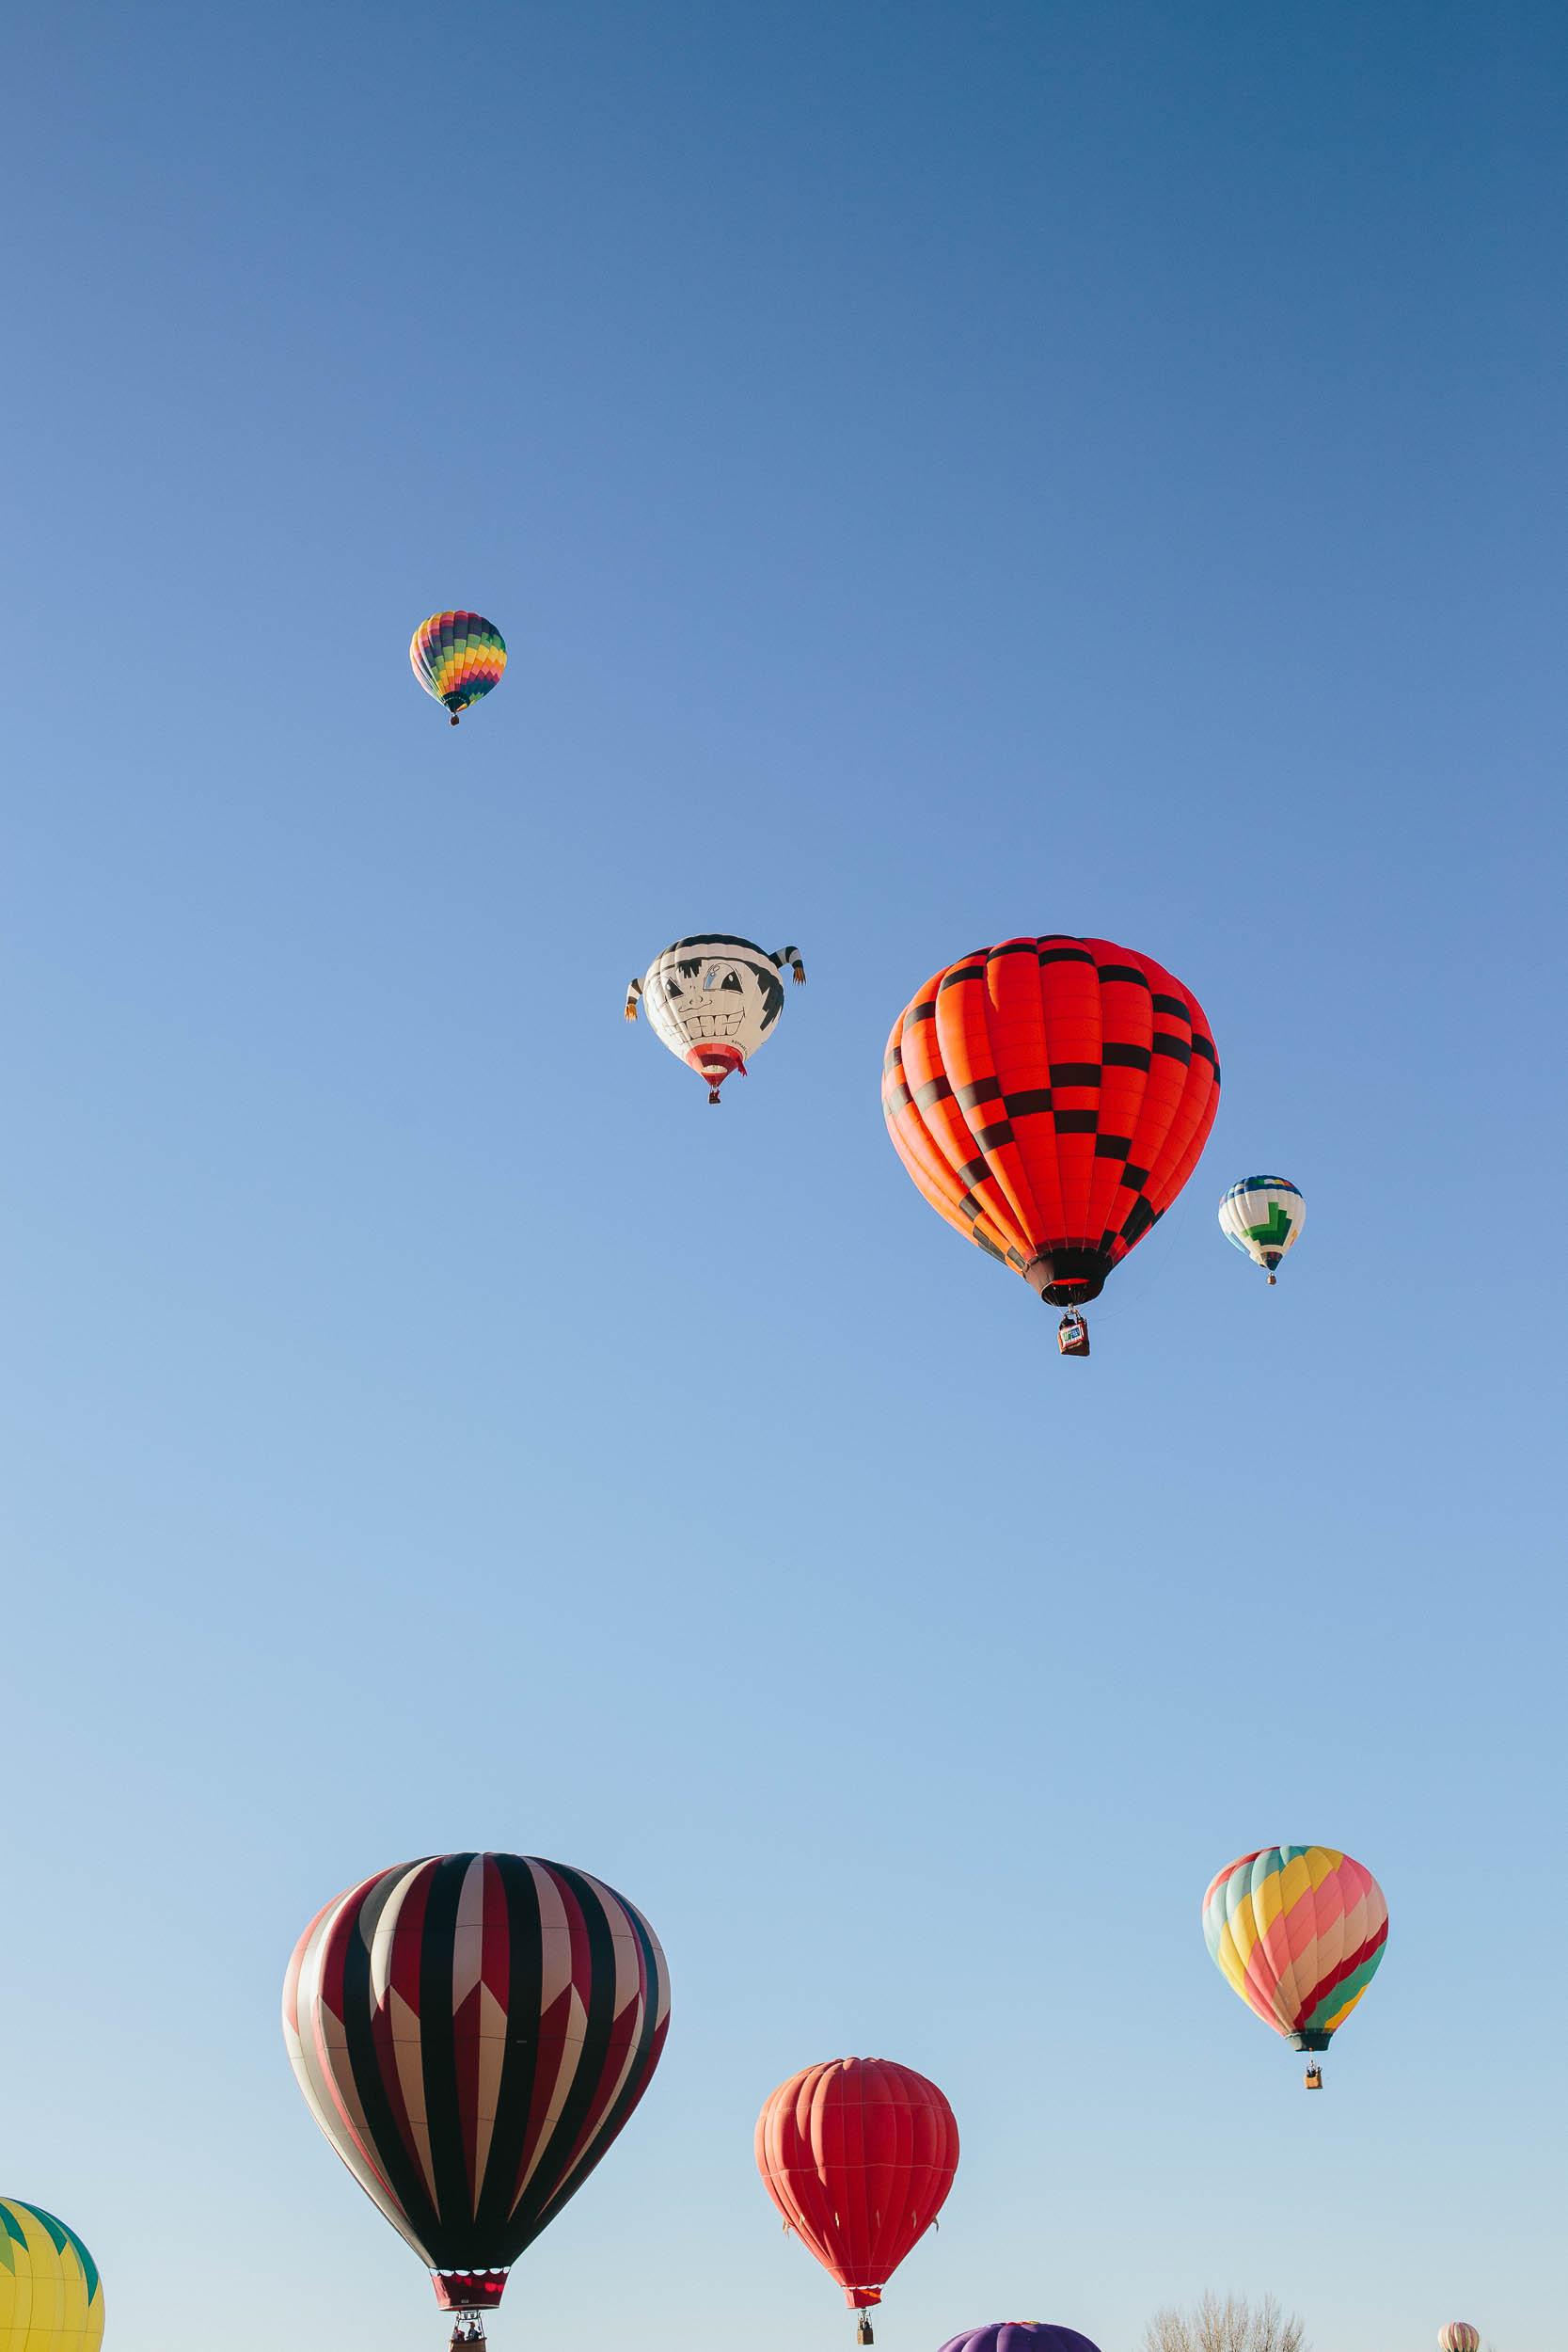 Kyle-Sheppard-Kanab-Balloon-Festival-28.jpg